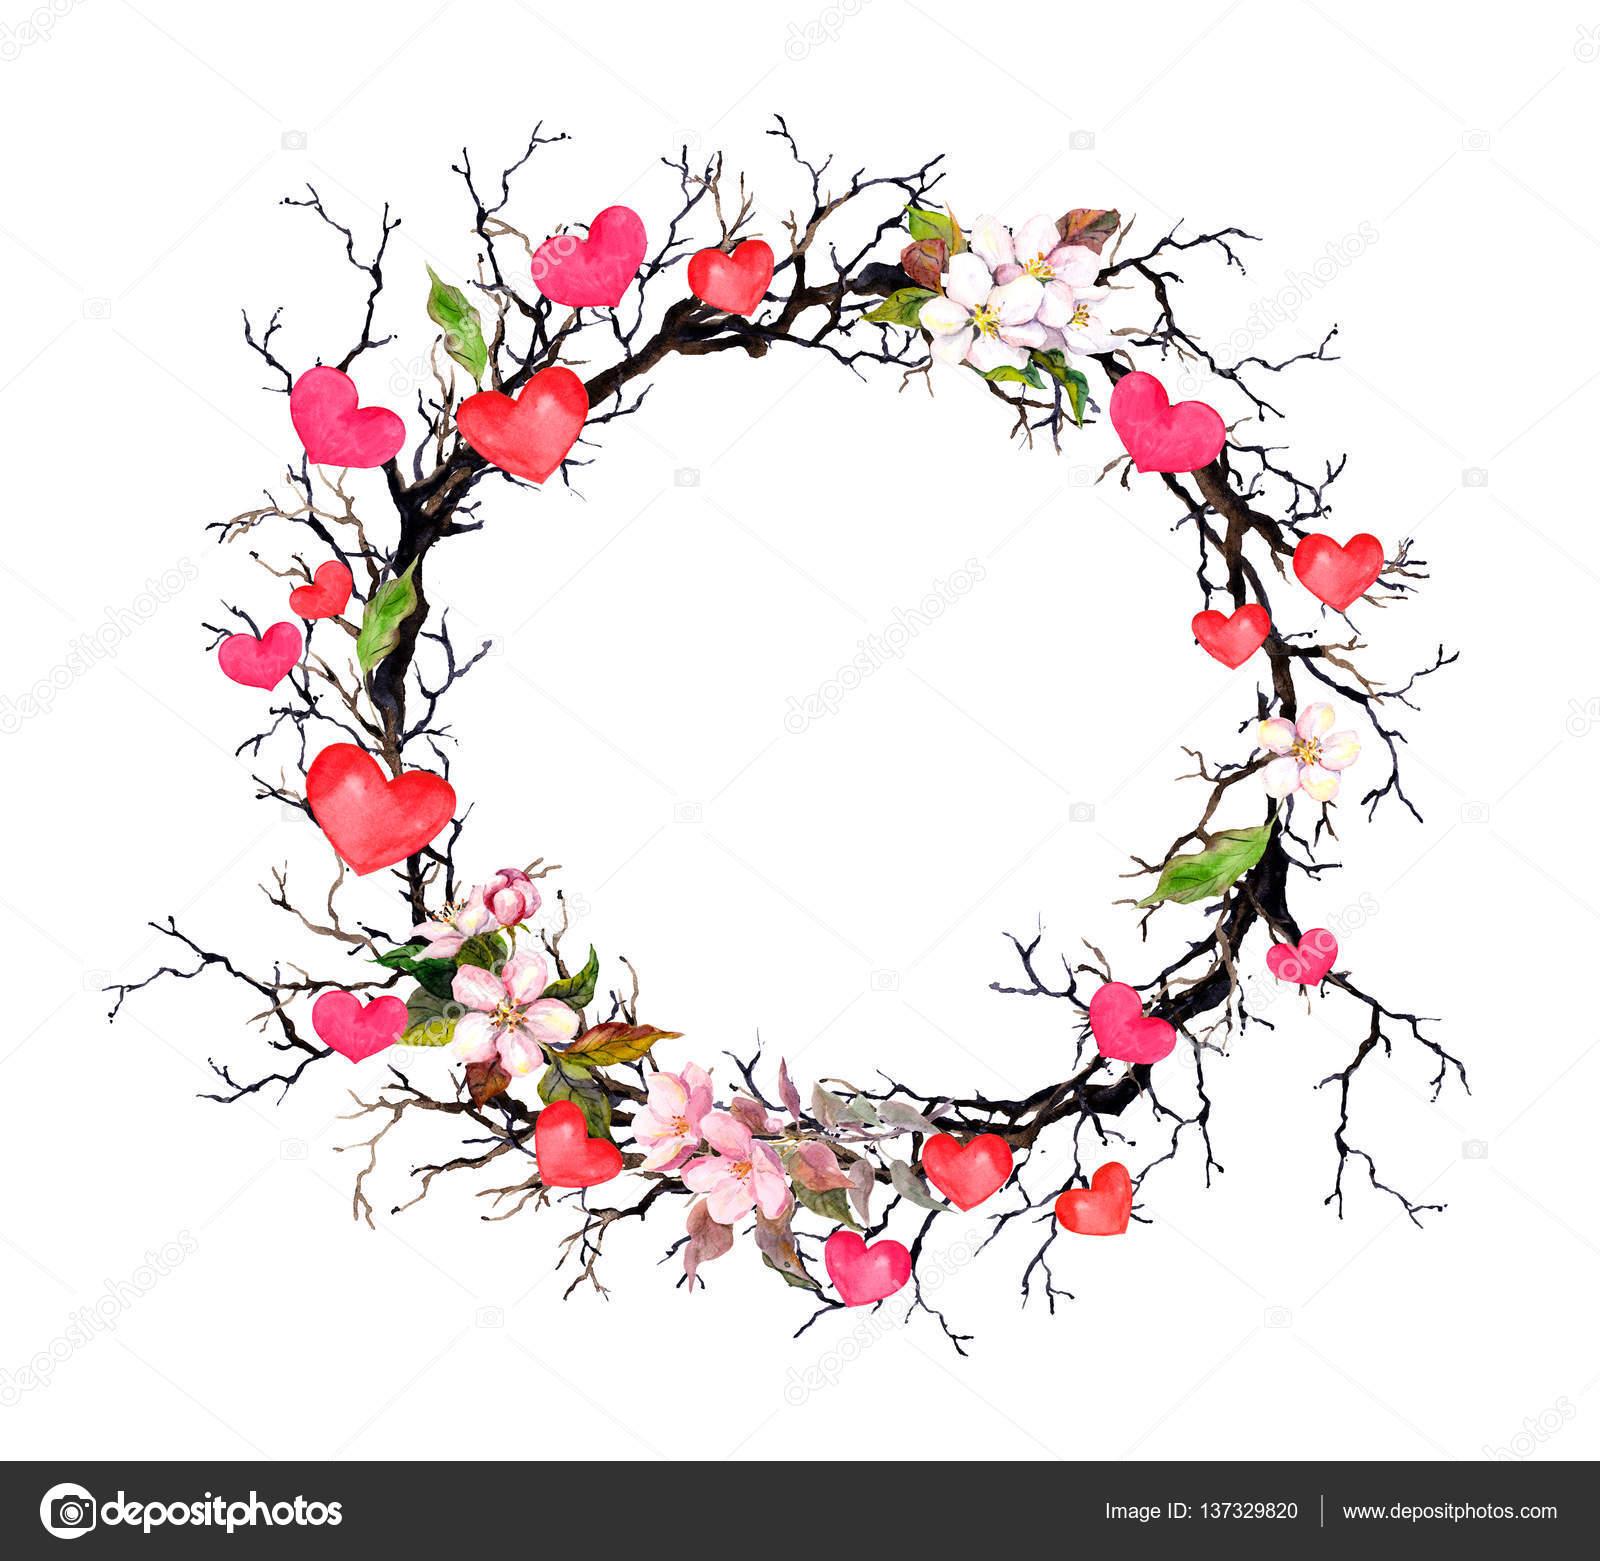 Merry Christmas Modern Guirnalda Floral Ramitas Con Flores De Primavera